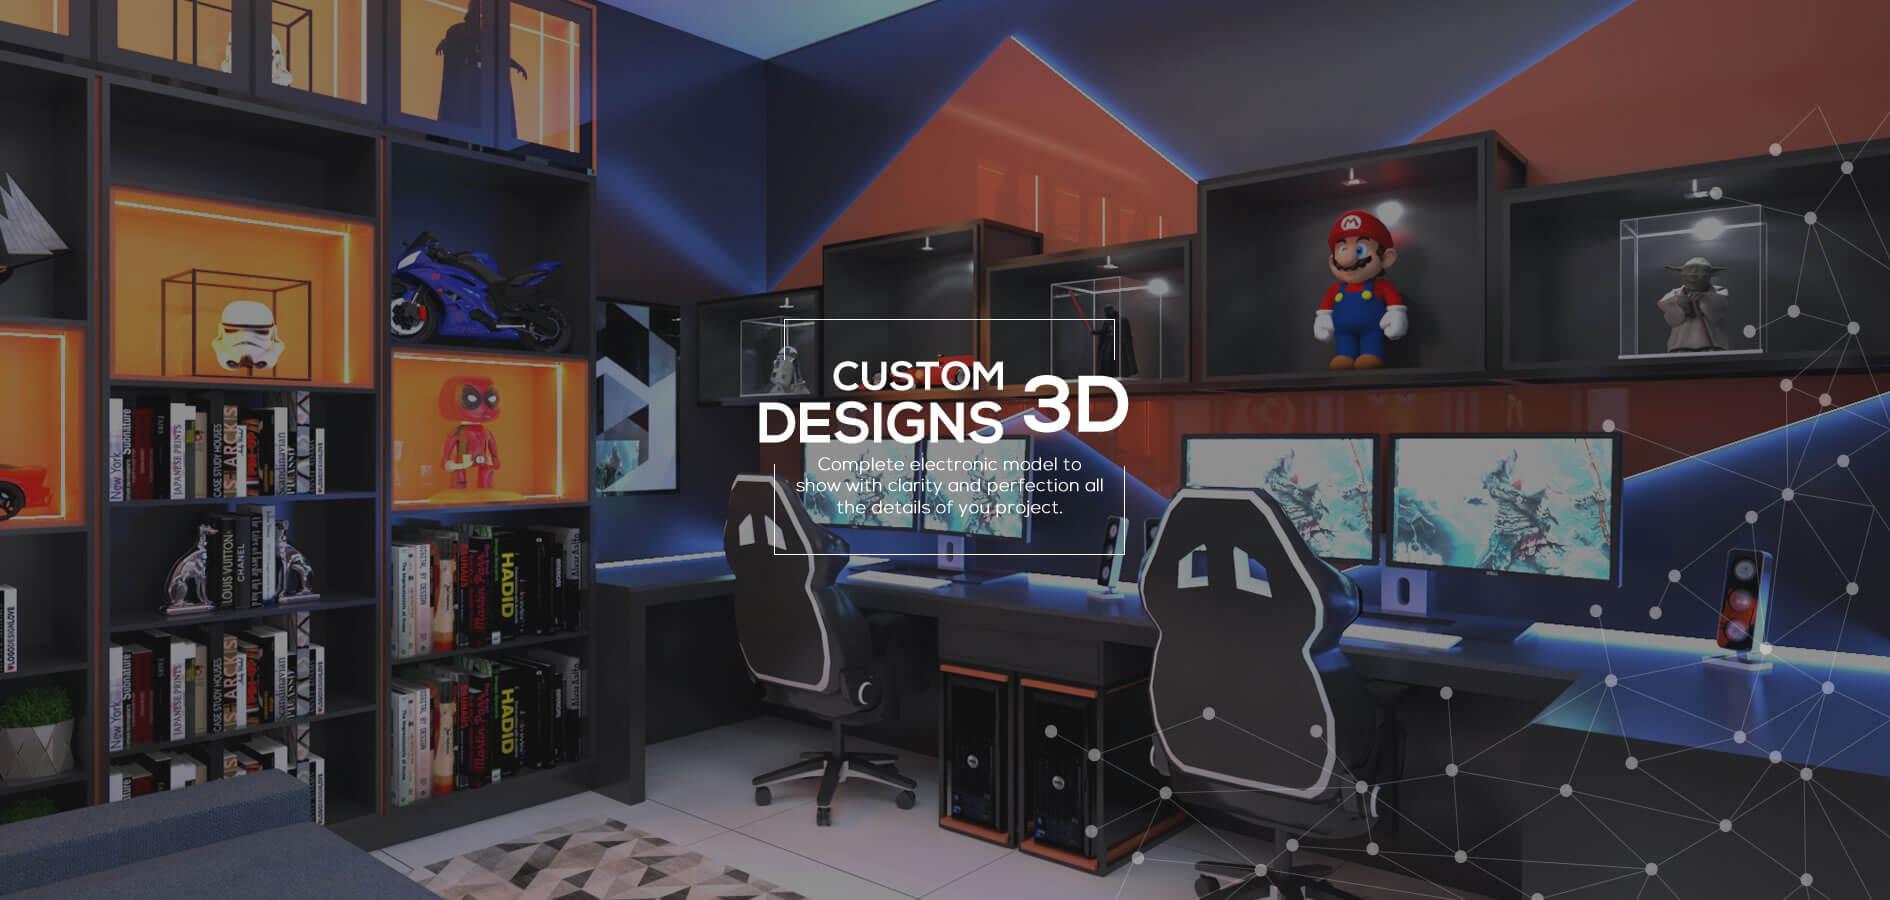 Custom Designs 3D